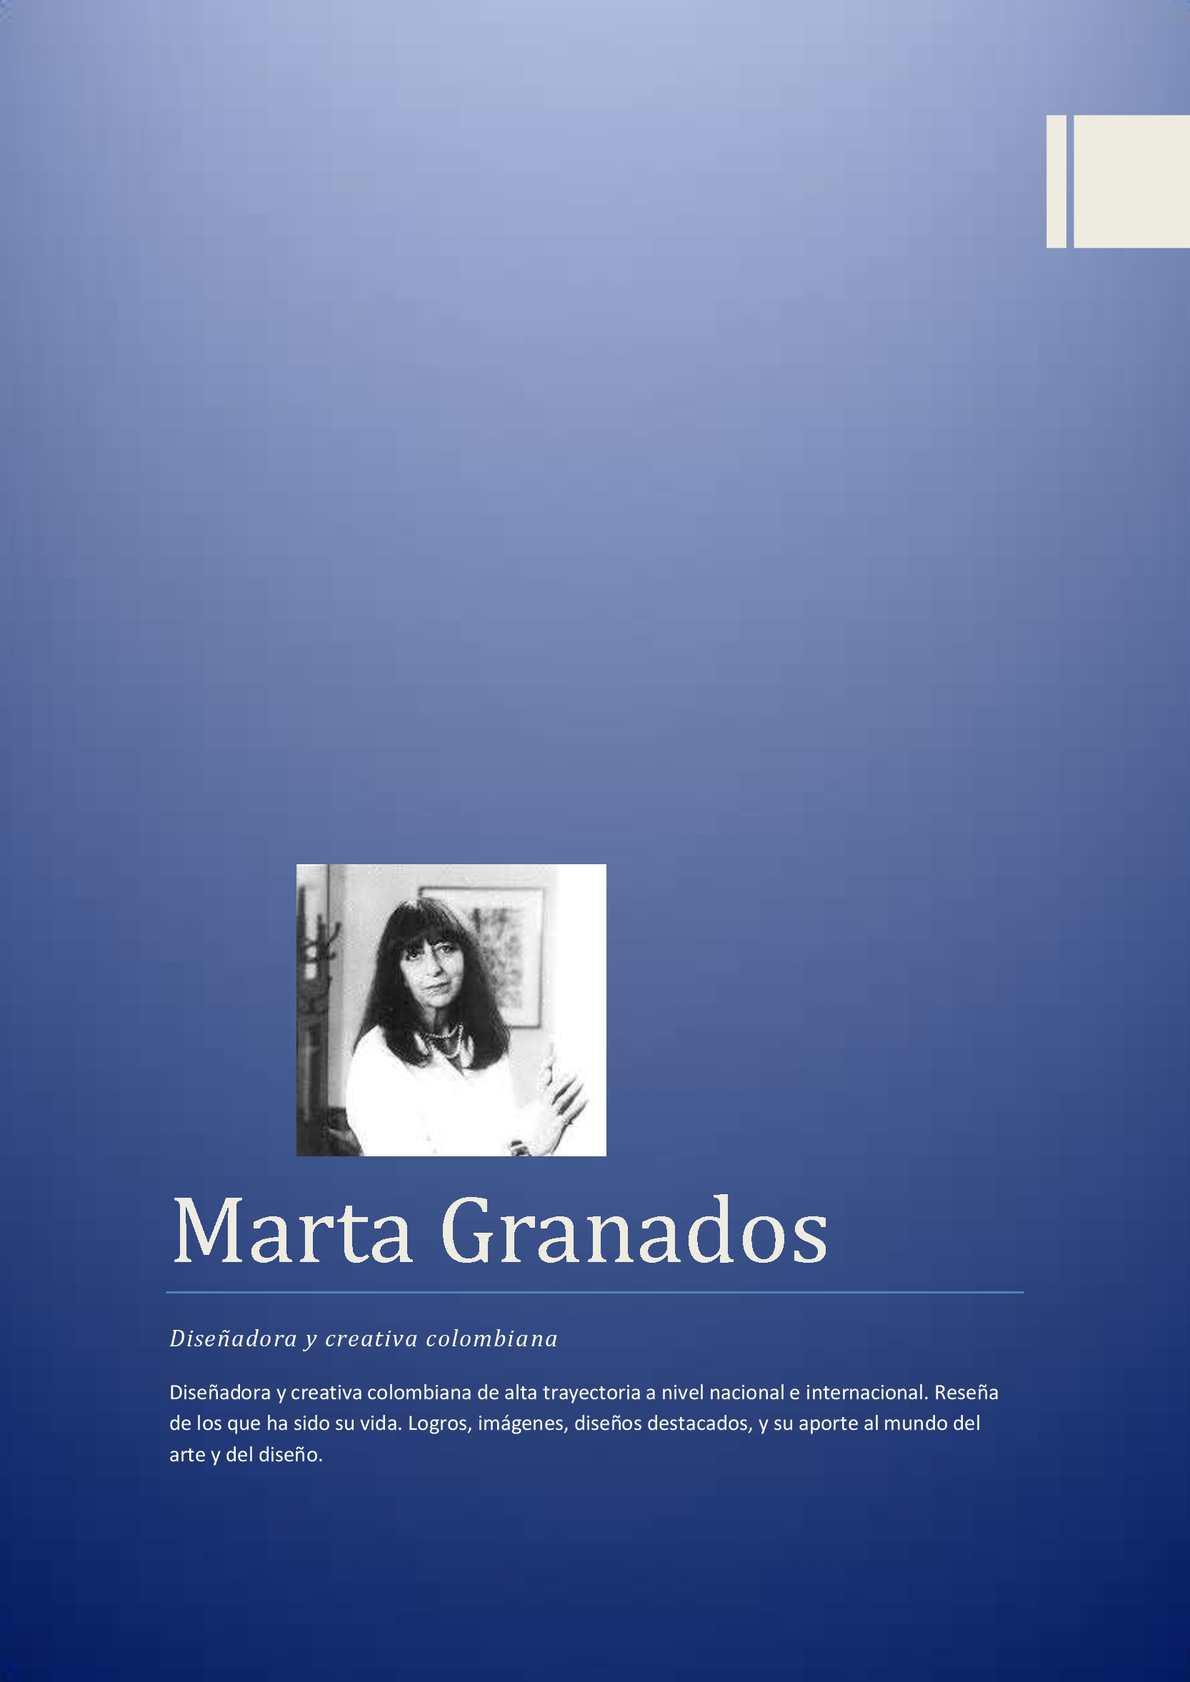 Martha Granados